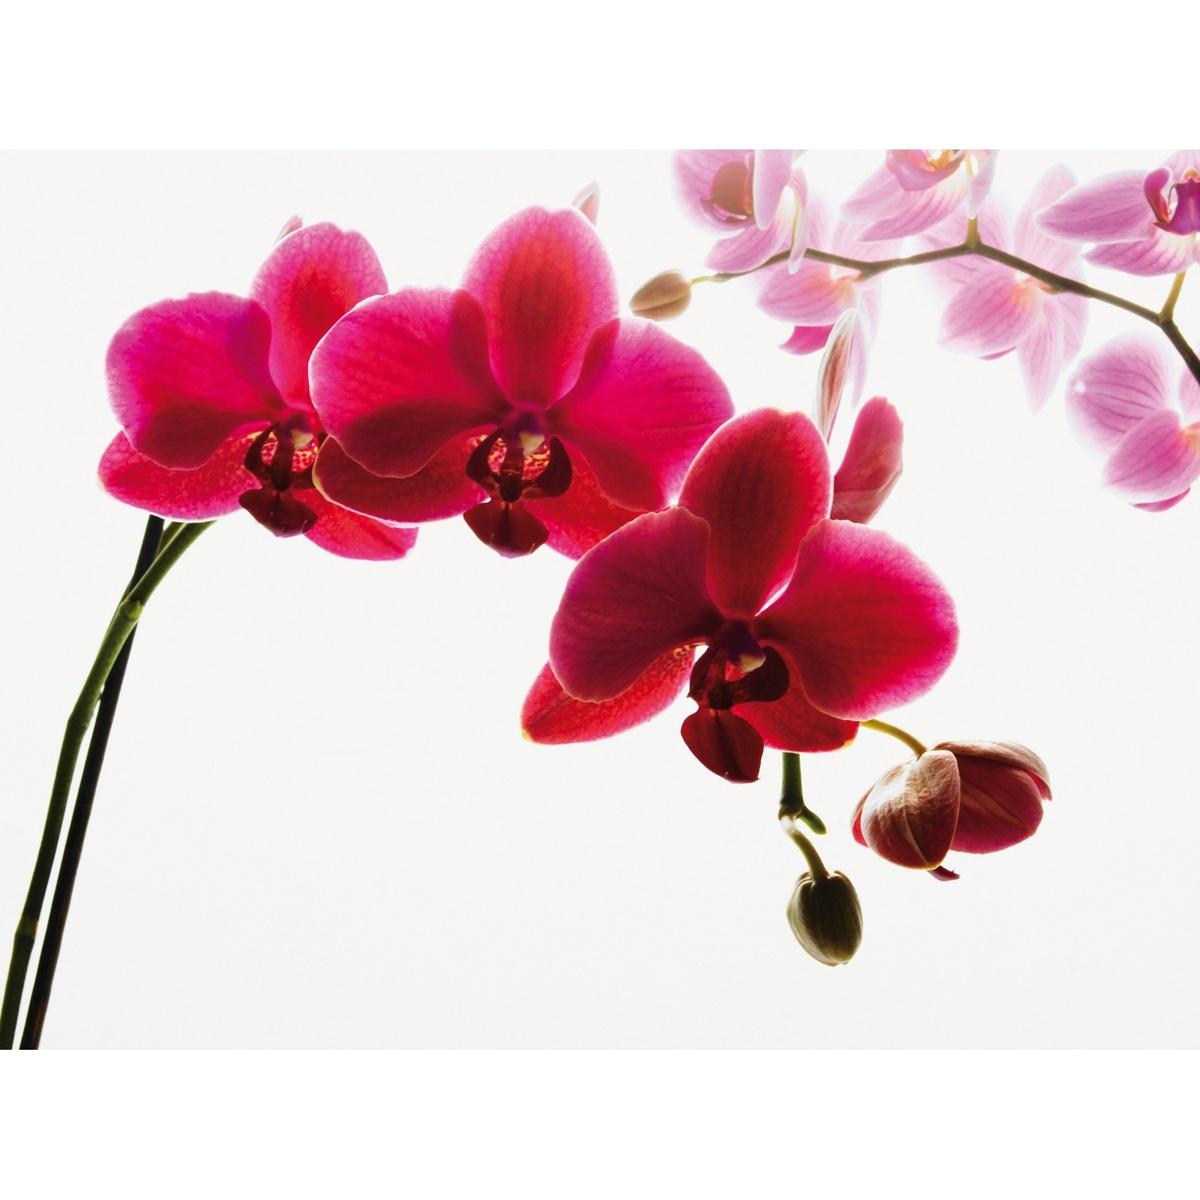 Fototapeta orchidej 315 x 232 cm, Wall